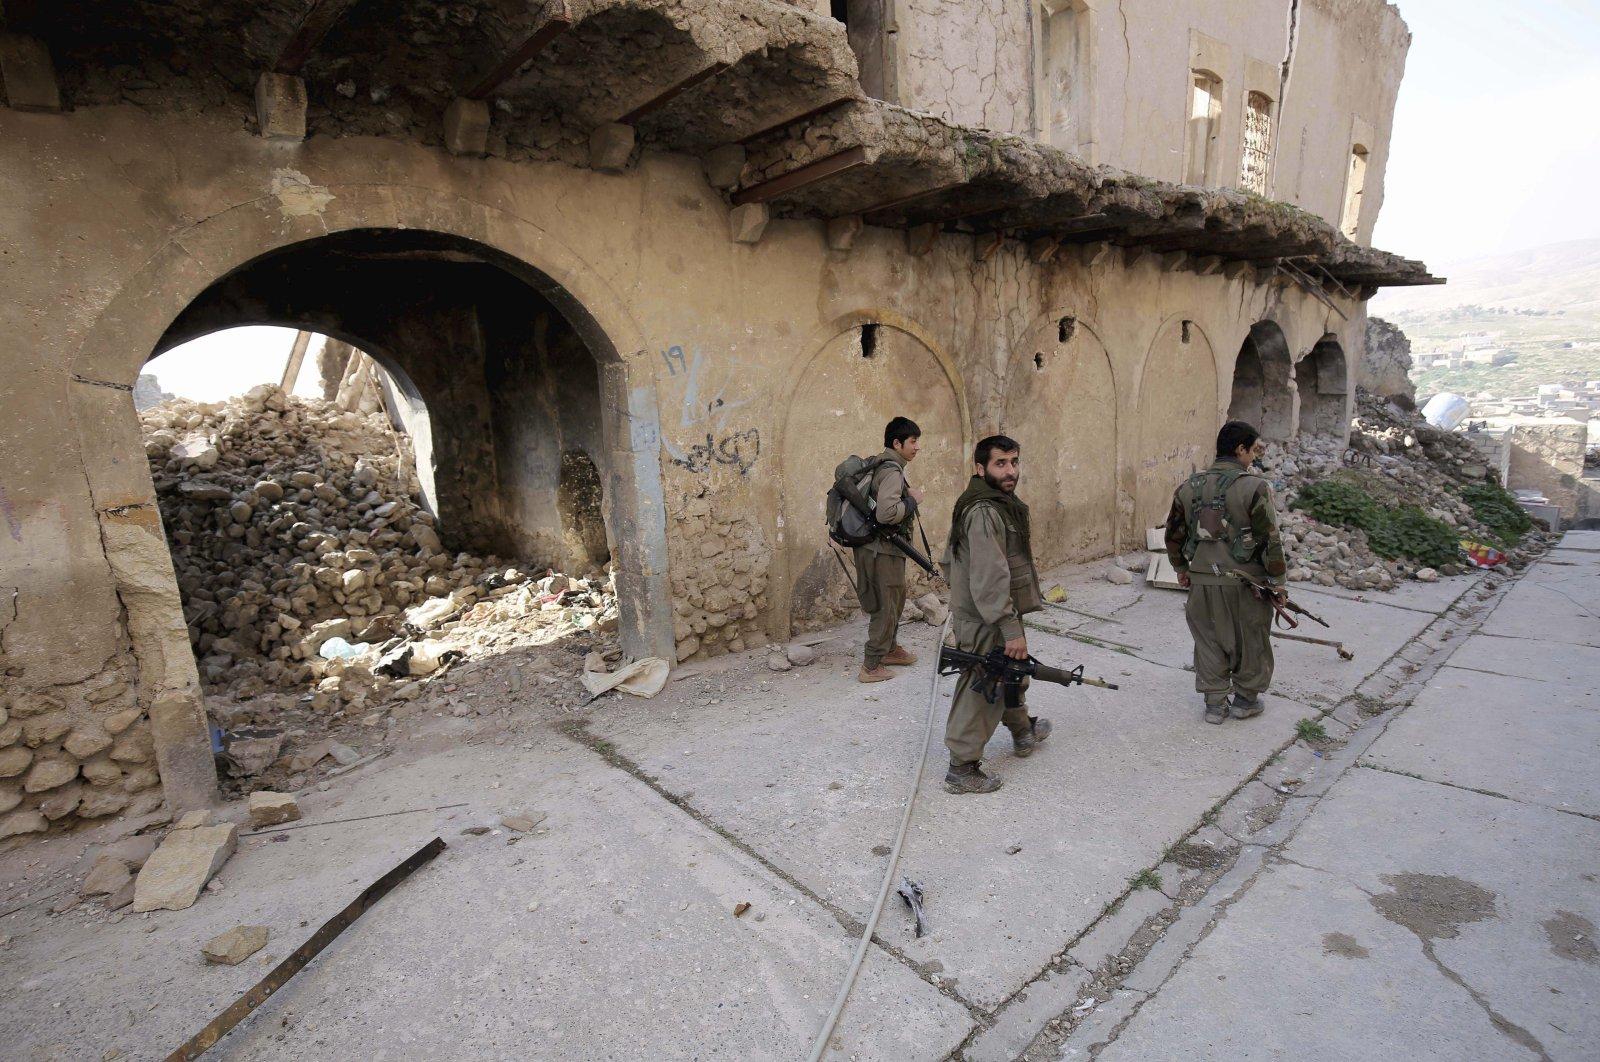 PKK terrorists walk in the damaged streets of Sinjar, Iraq, on Thursday, Jan. 29, 2015. (AP File Photo)